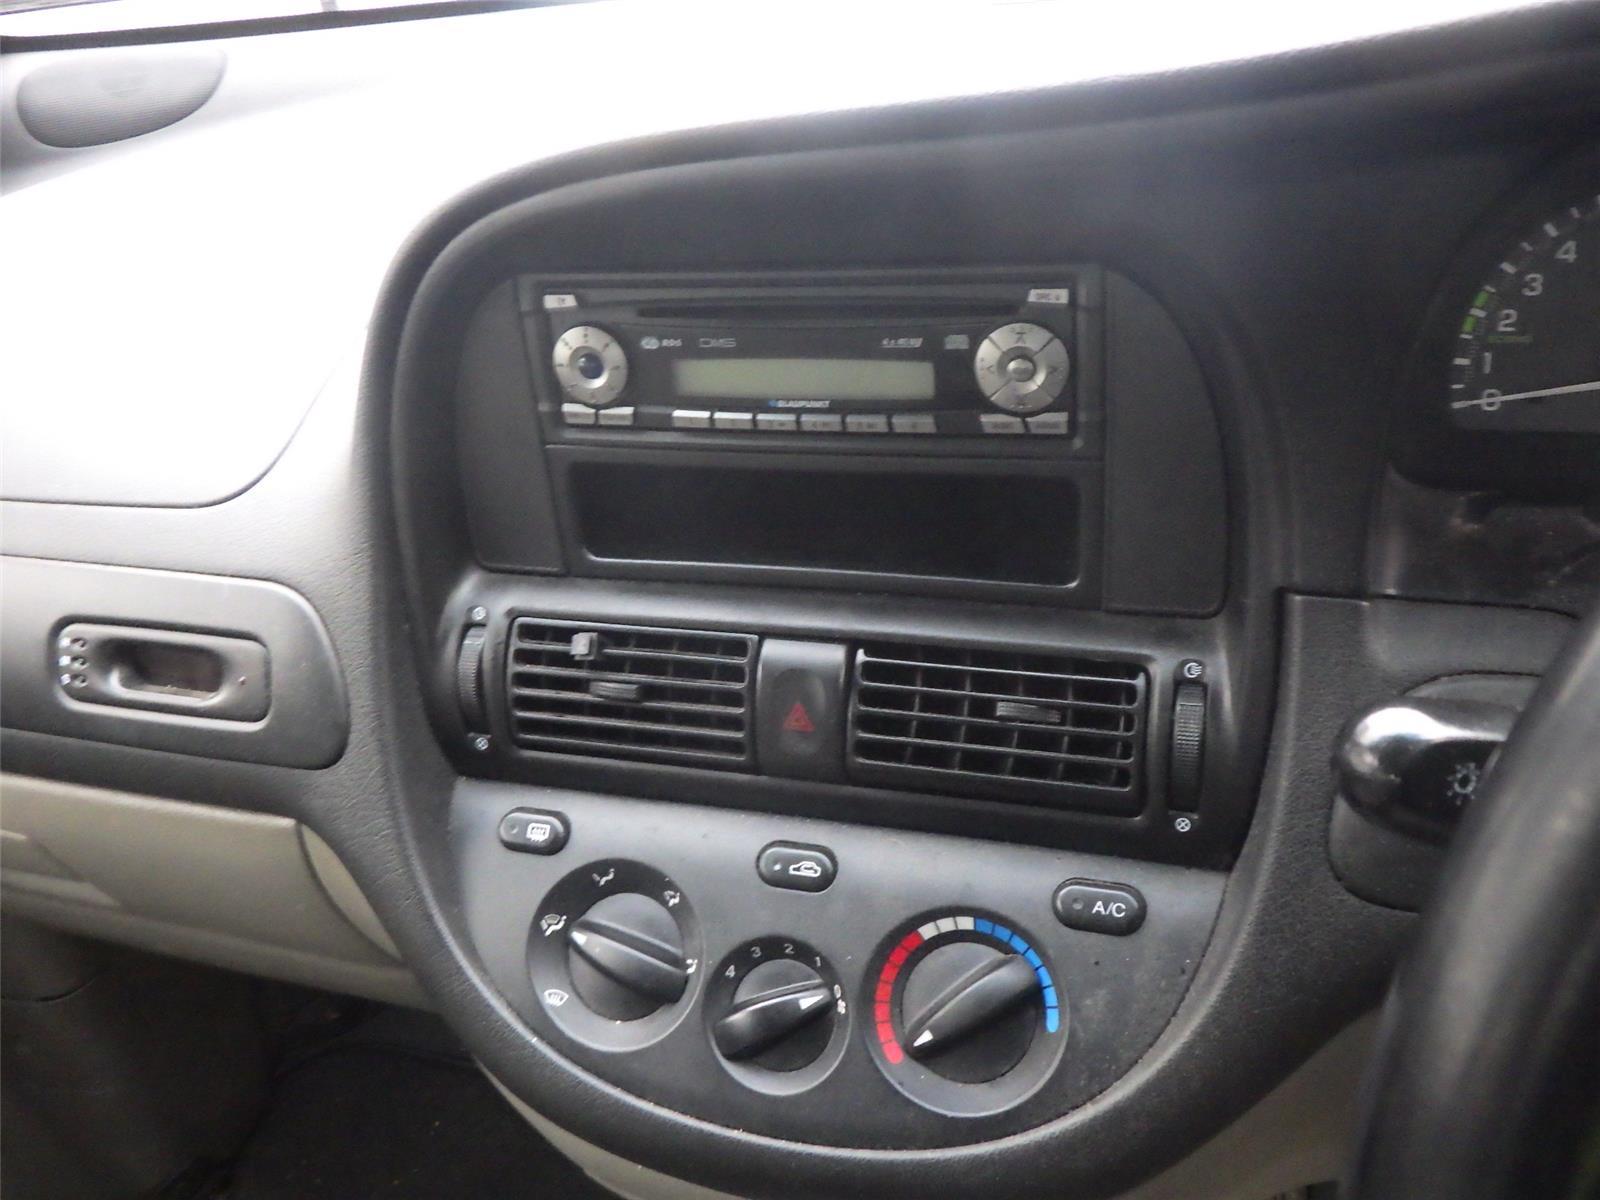 2006 Chevrolet Tacuma 2005 To 2008 M P V Petrol Manual